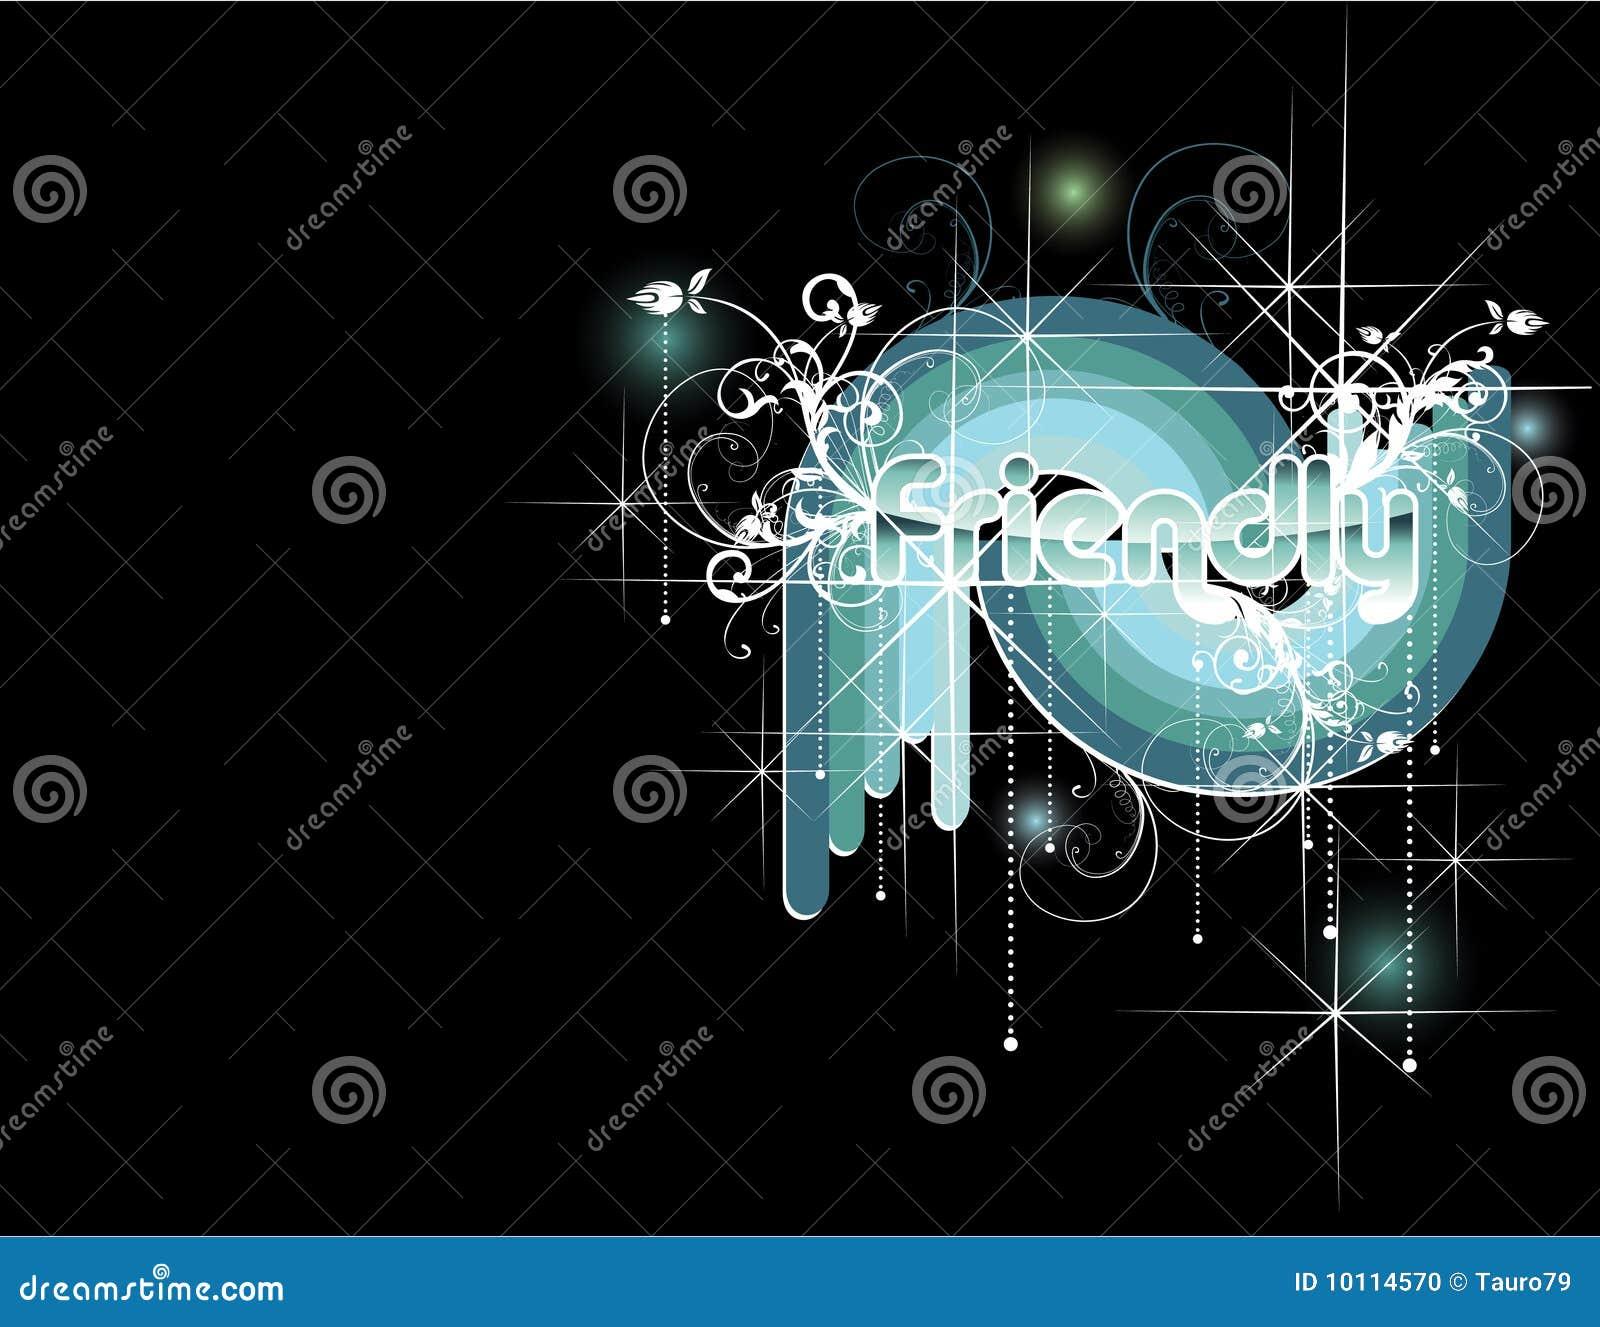 Download Vector flower illustration stock vector. Illustration of grunge - 10114570